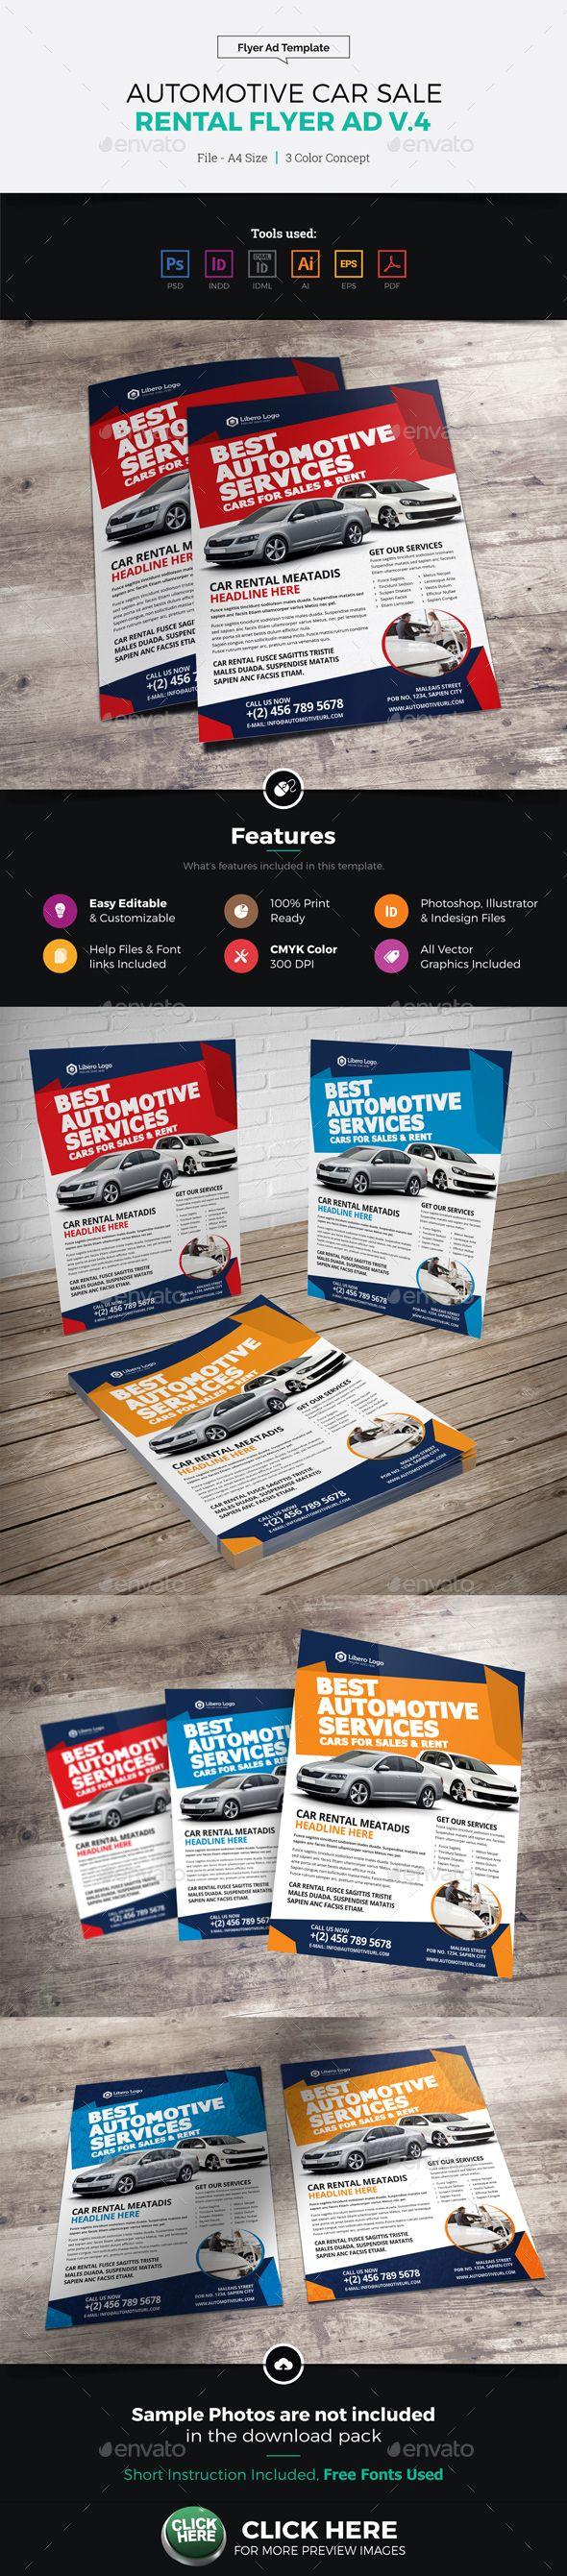 cover letter for bid proposal%0A Automotive Car Sale Rental Flyer Ad v